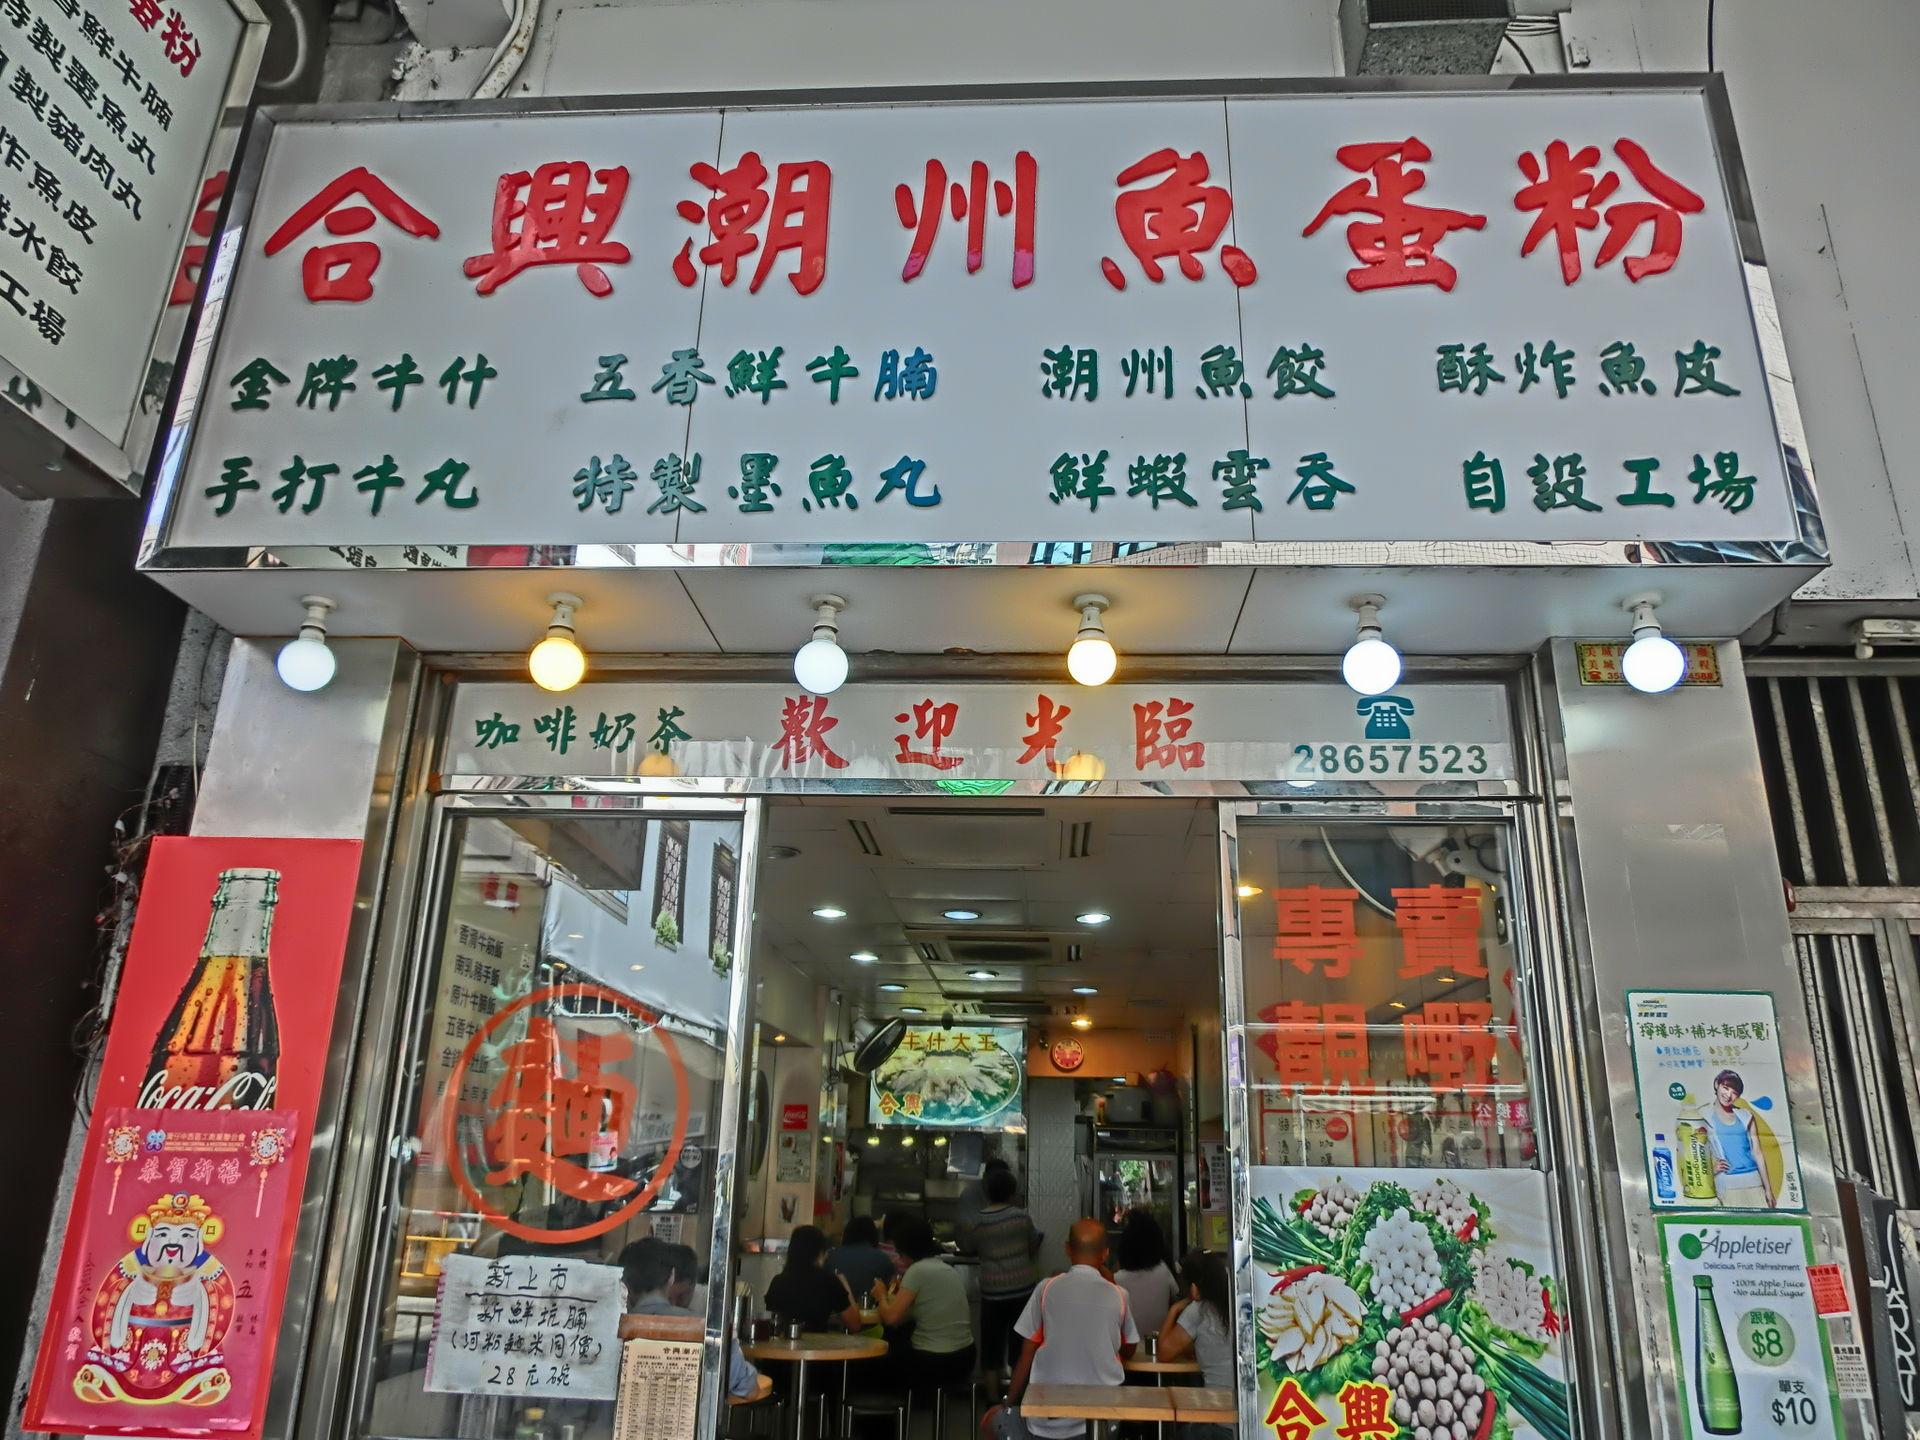 HK_Wan_Chai_Queen's_Road_East_Hop_Hing_Chiu_Chow_Fish_Ball_Noodle_Restaurant_sign_June-2013